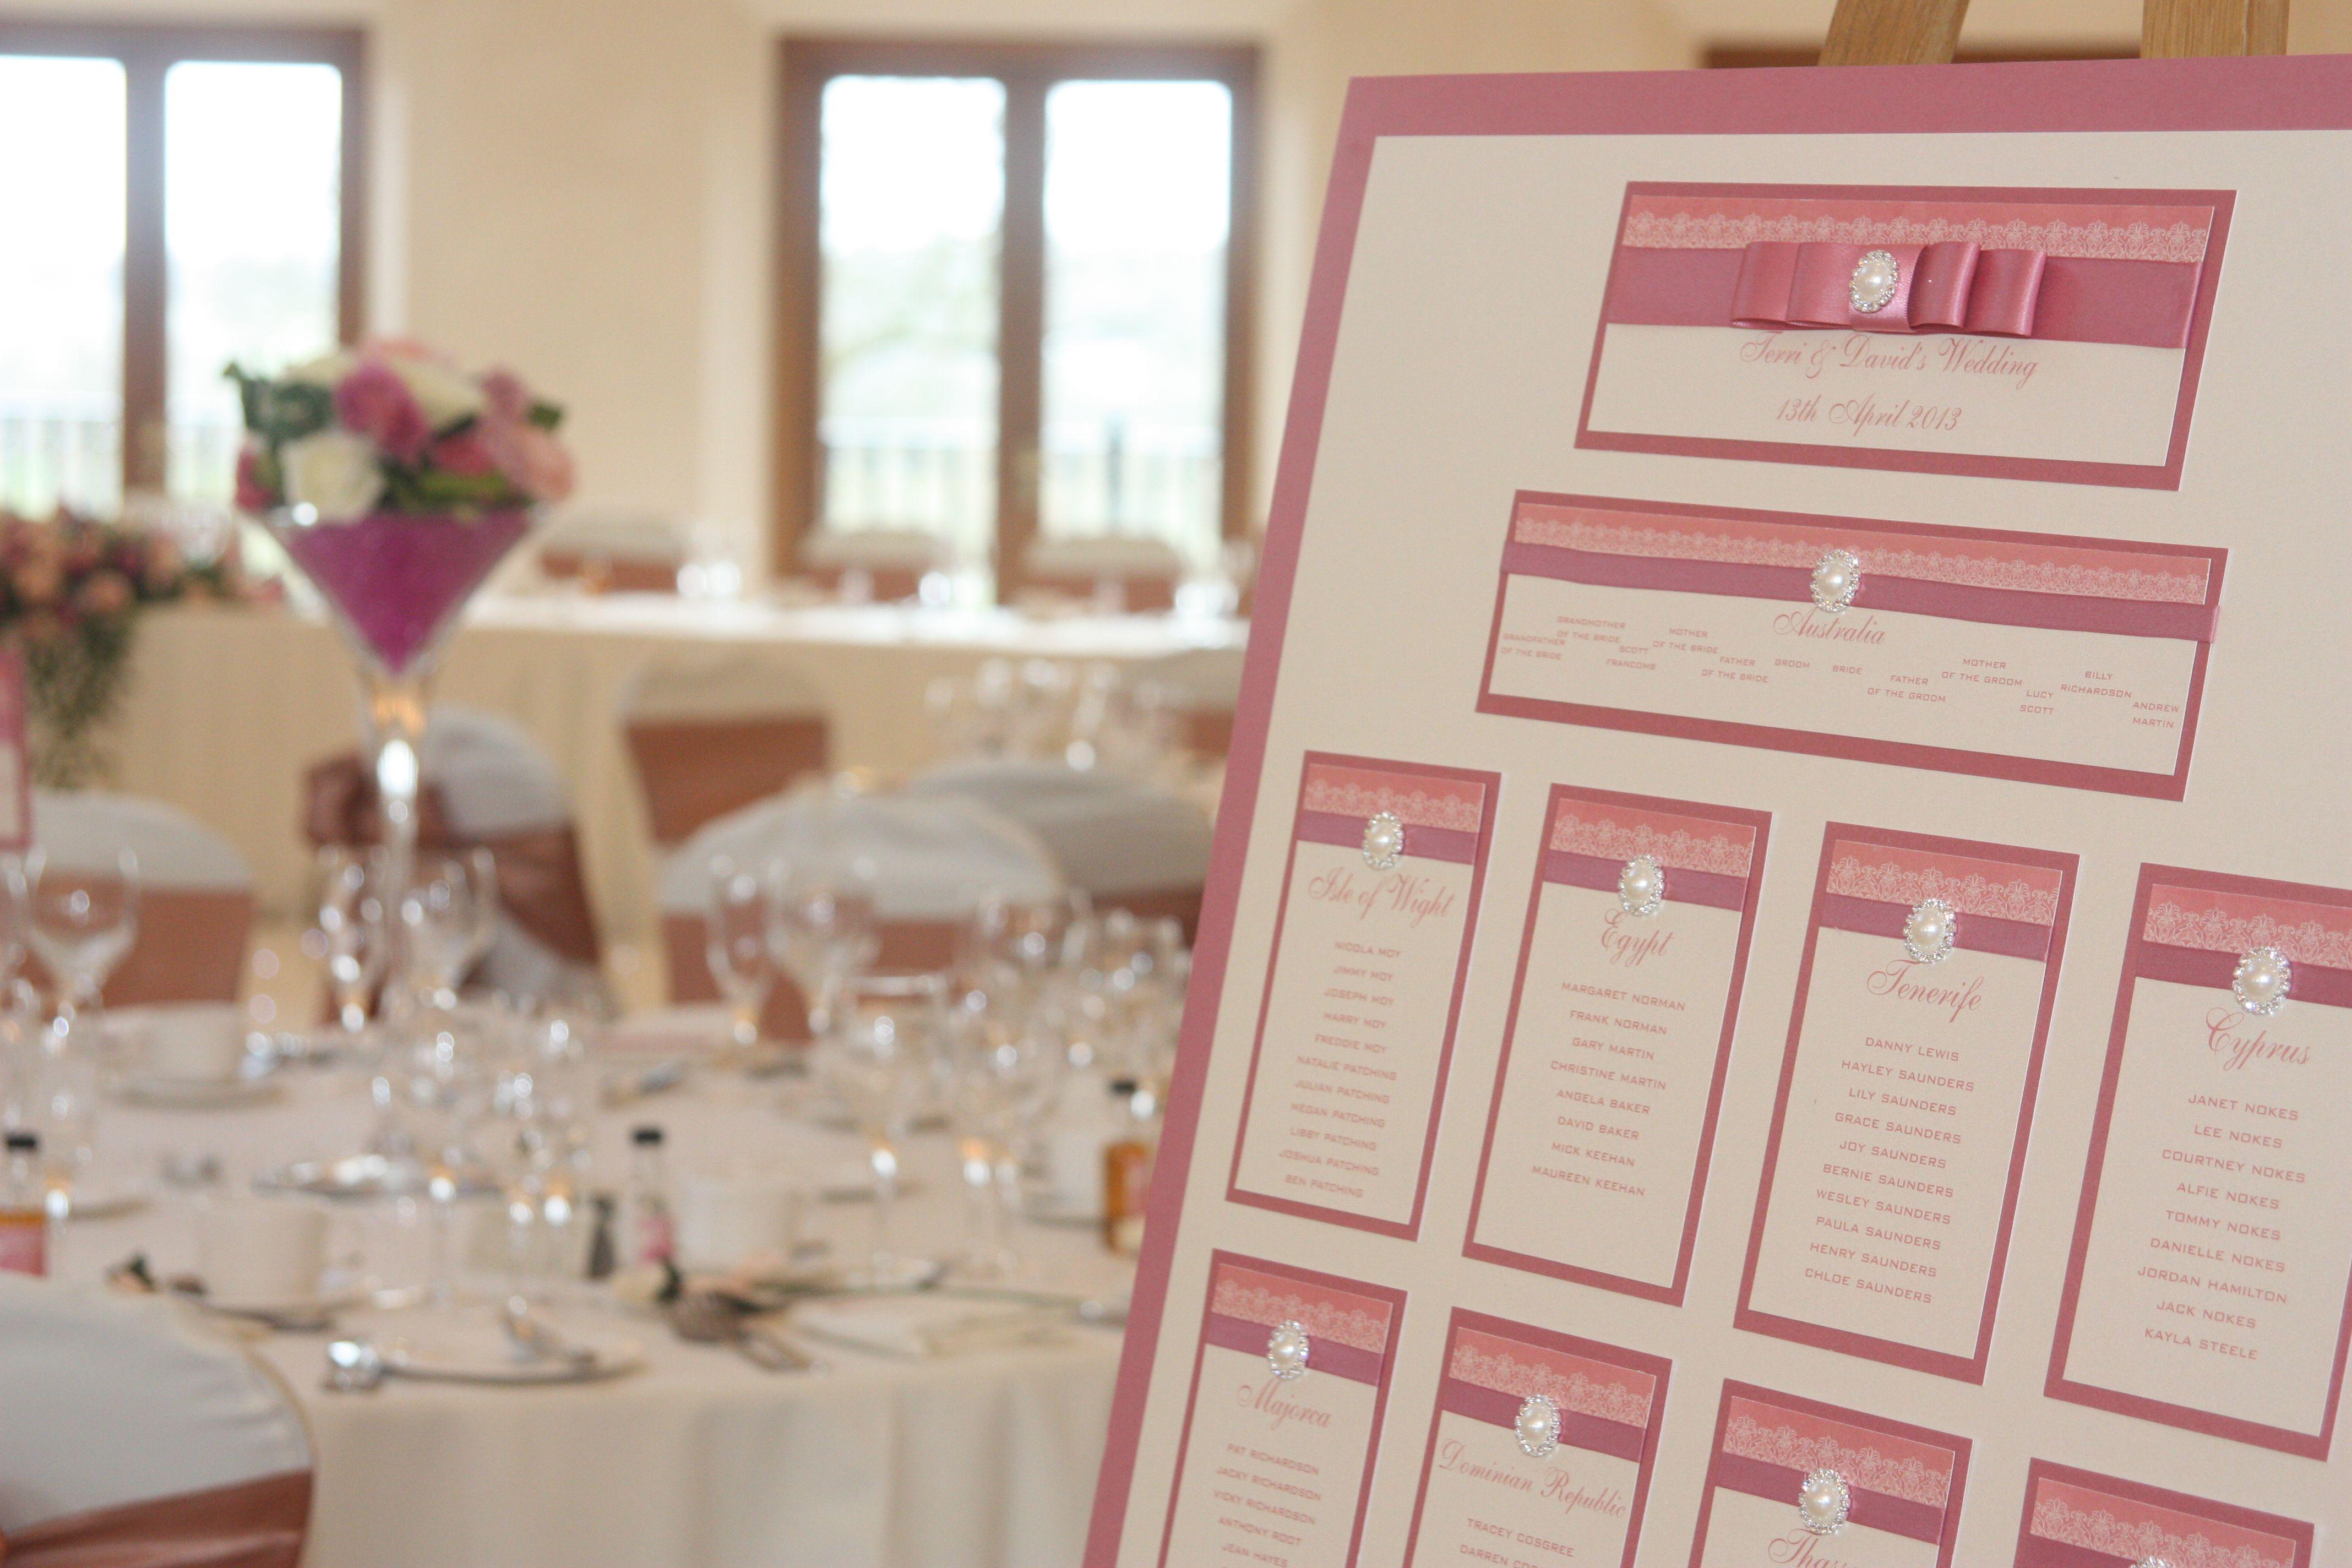 Dusky pink ivory wedding table plan pretty vintage lace and pearl dusky pink ivory wedding table plan pretty vintage lace and pearl design that co junglespirit Choice Image